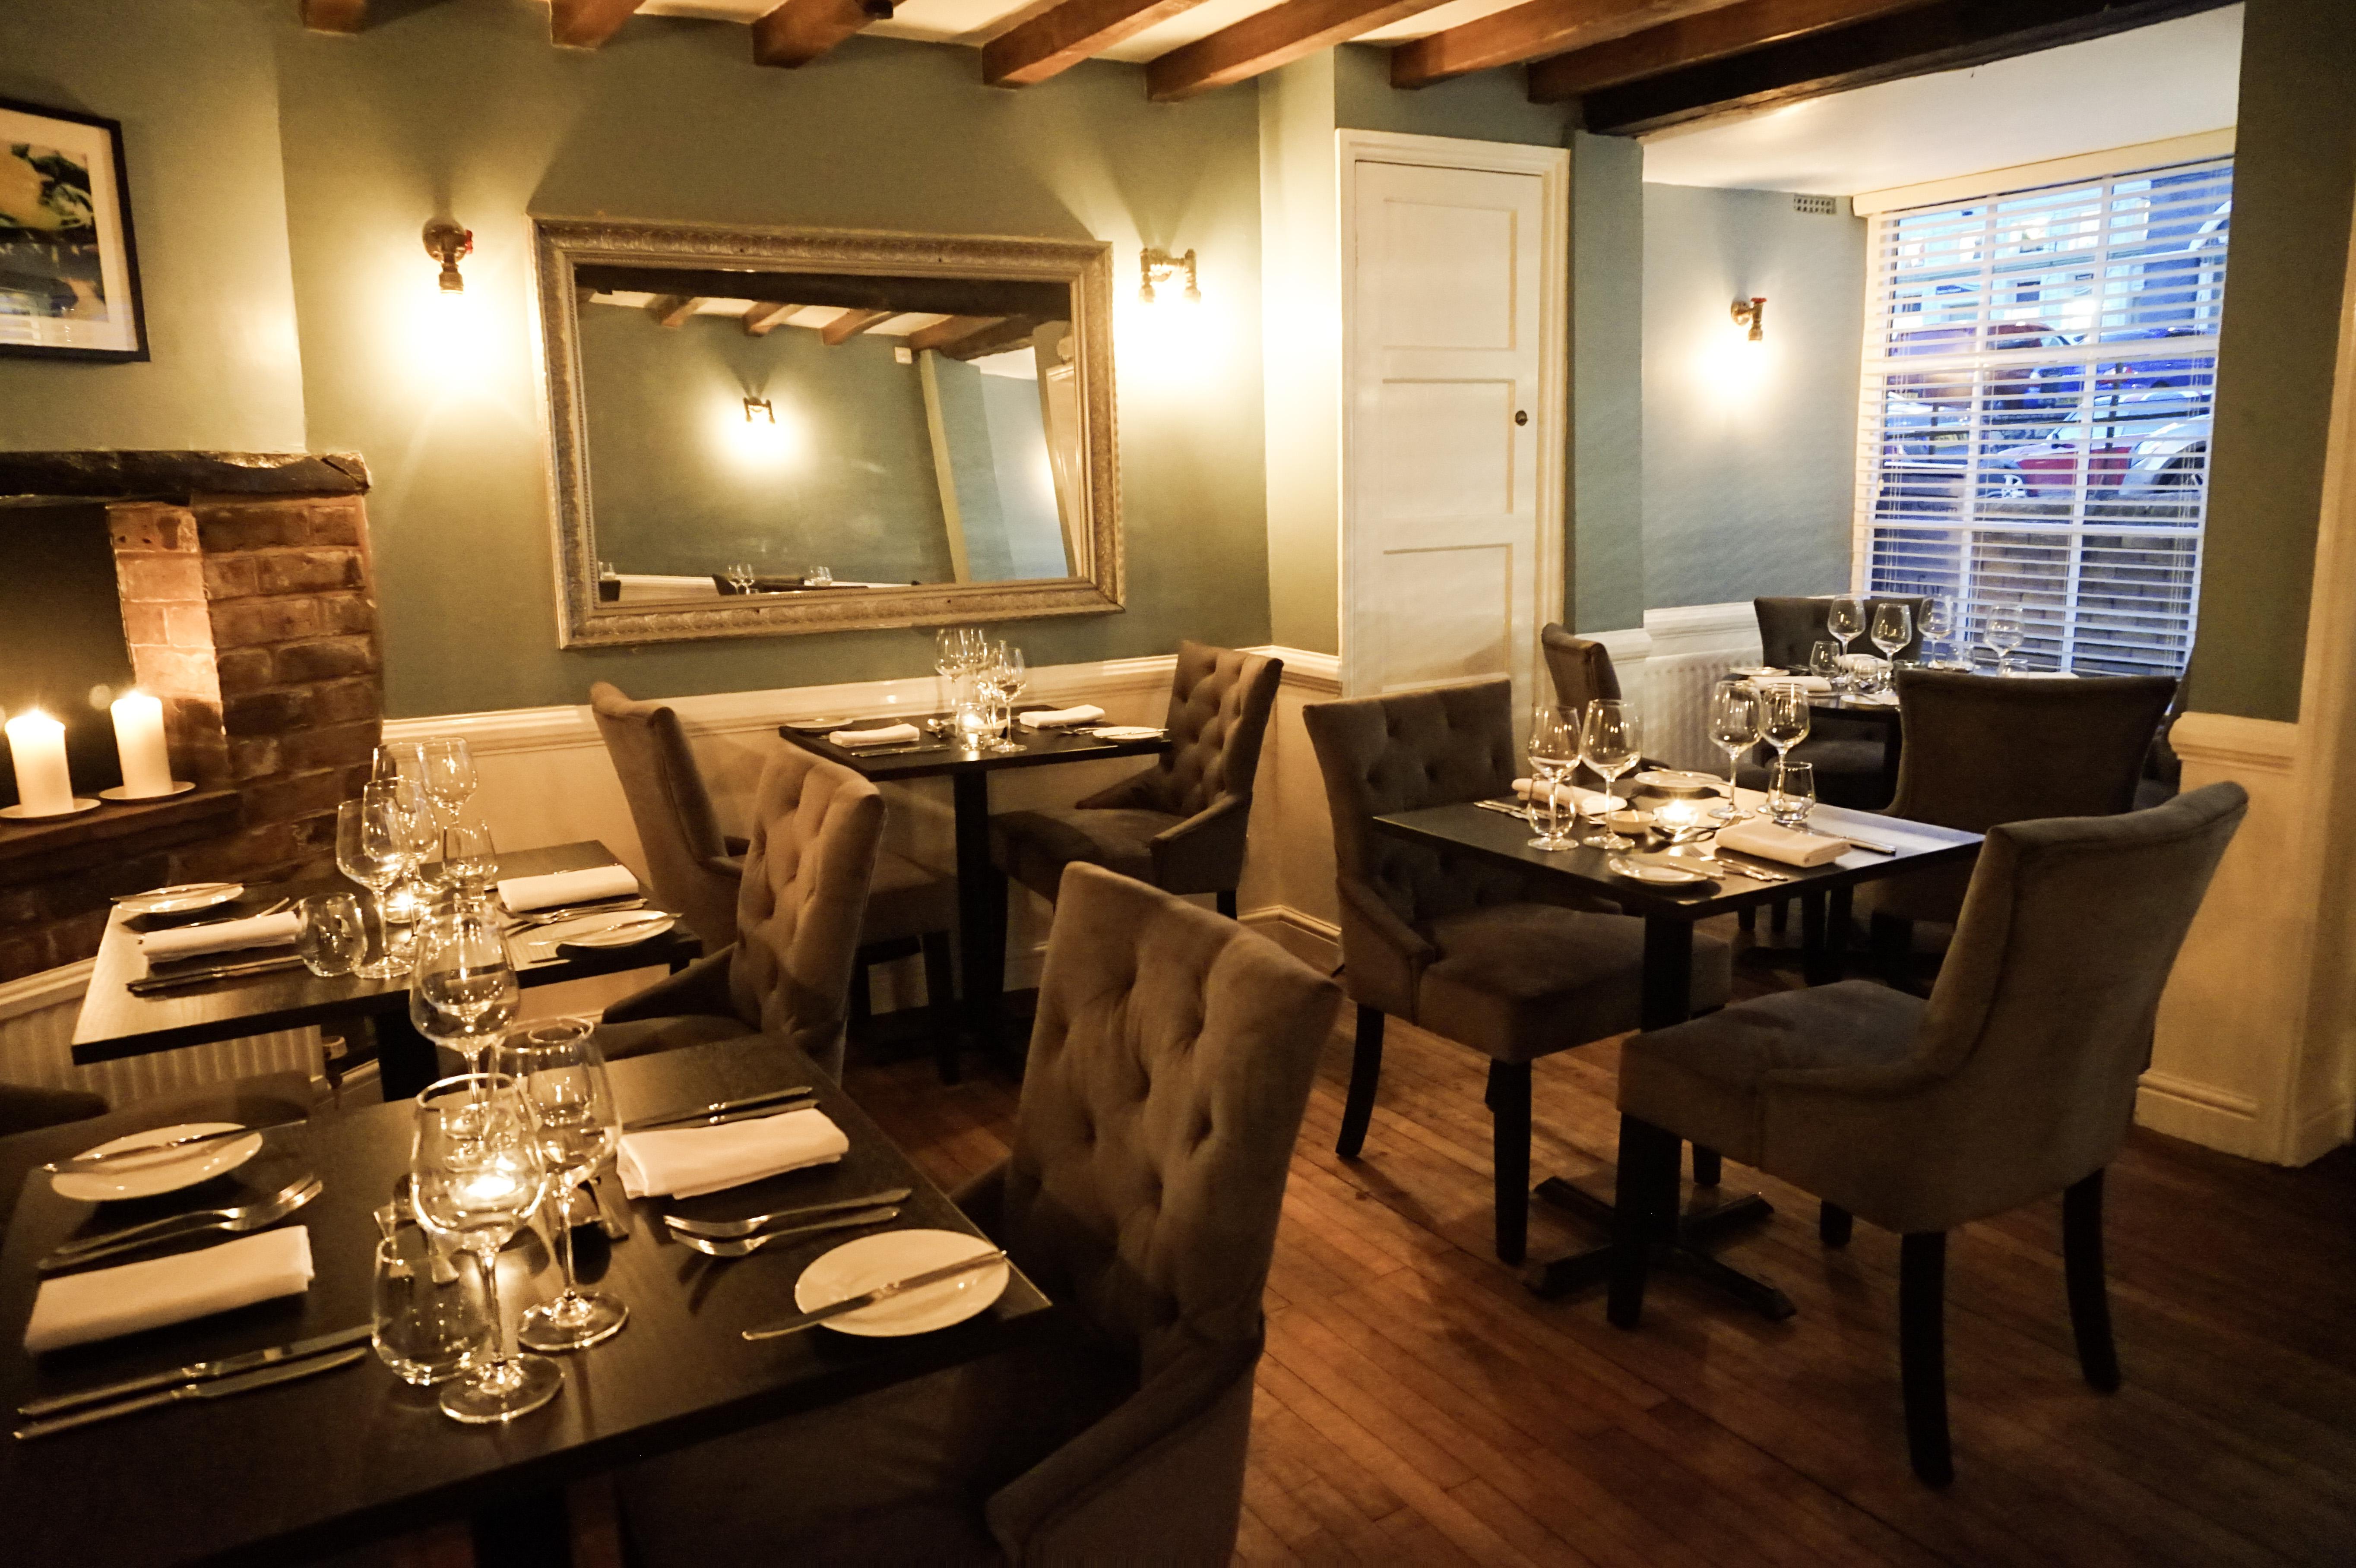 Restaurant Interior 1